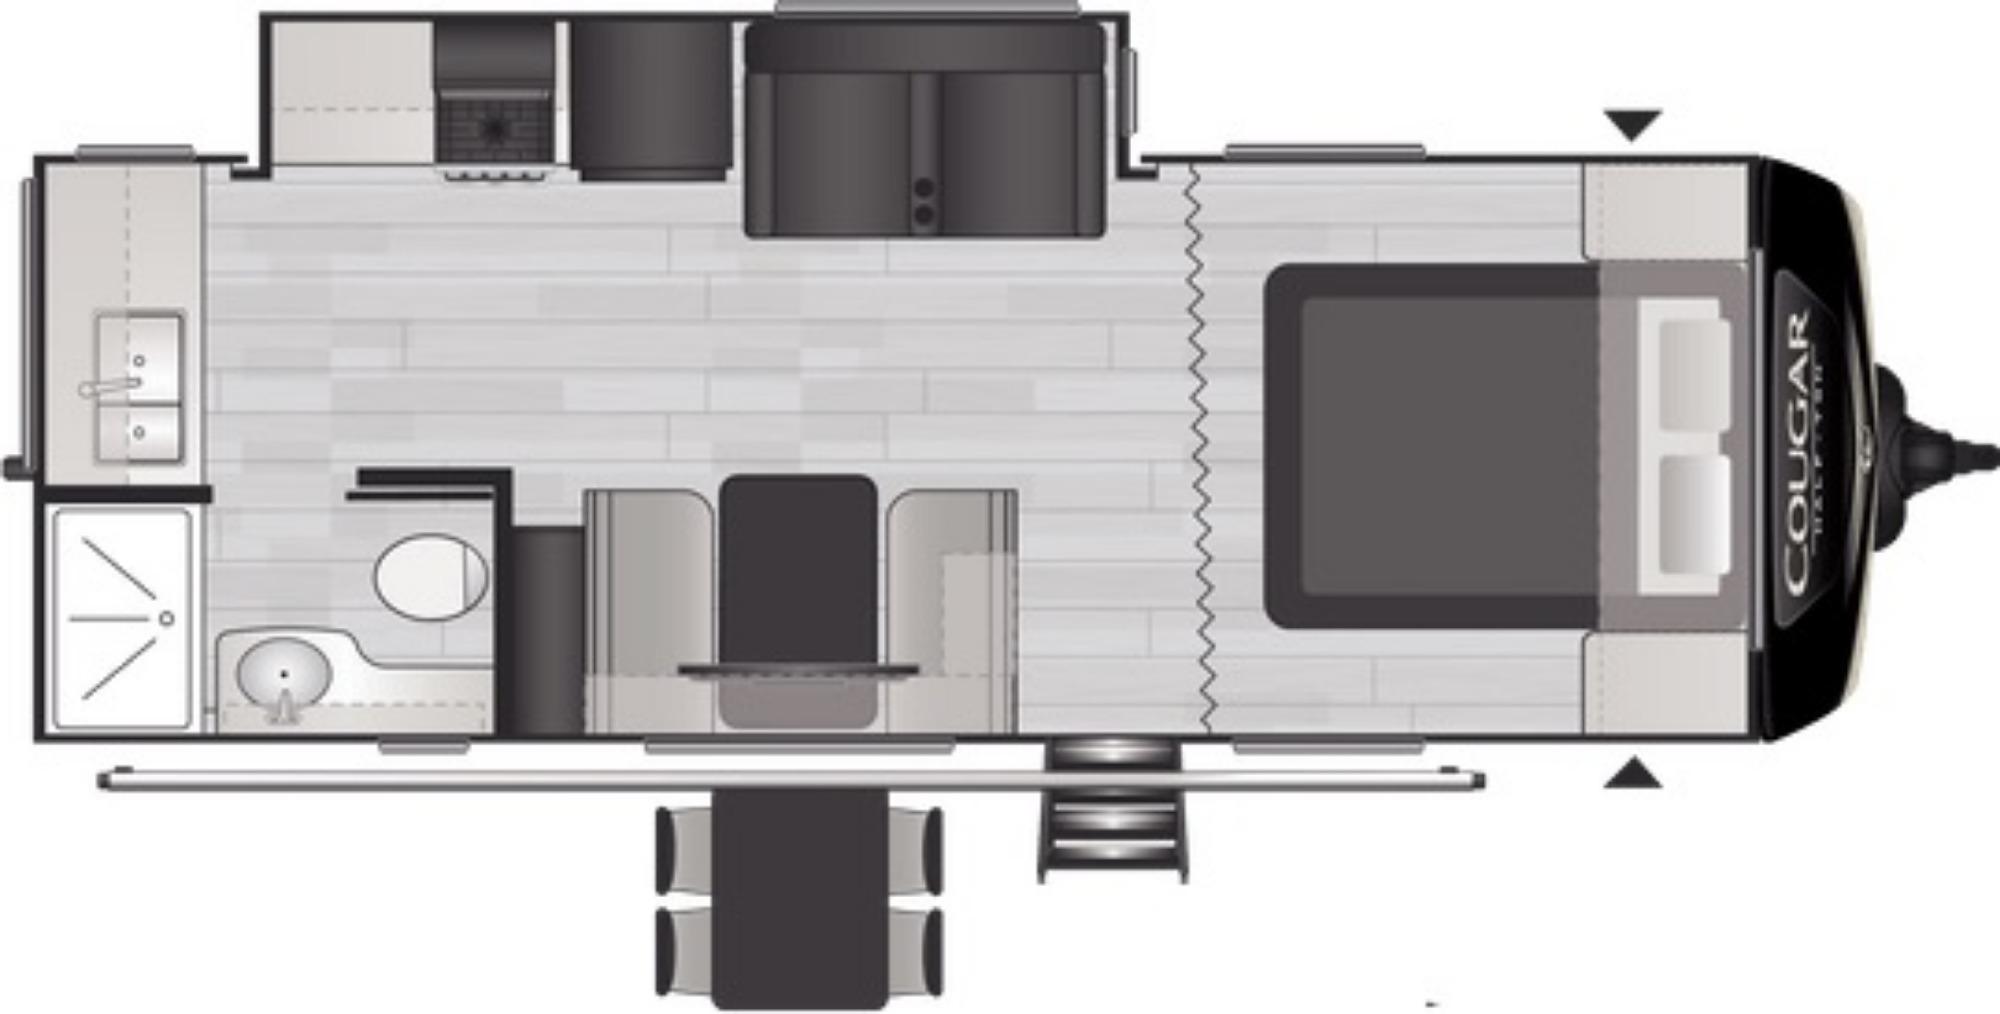 View Floor Plan for 2021 KEYSTONE COUGAR 22MLSWE